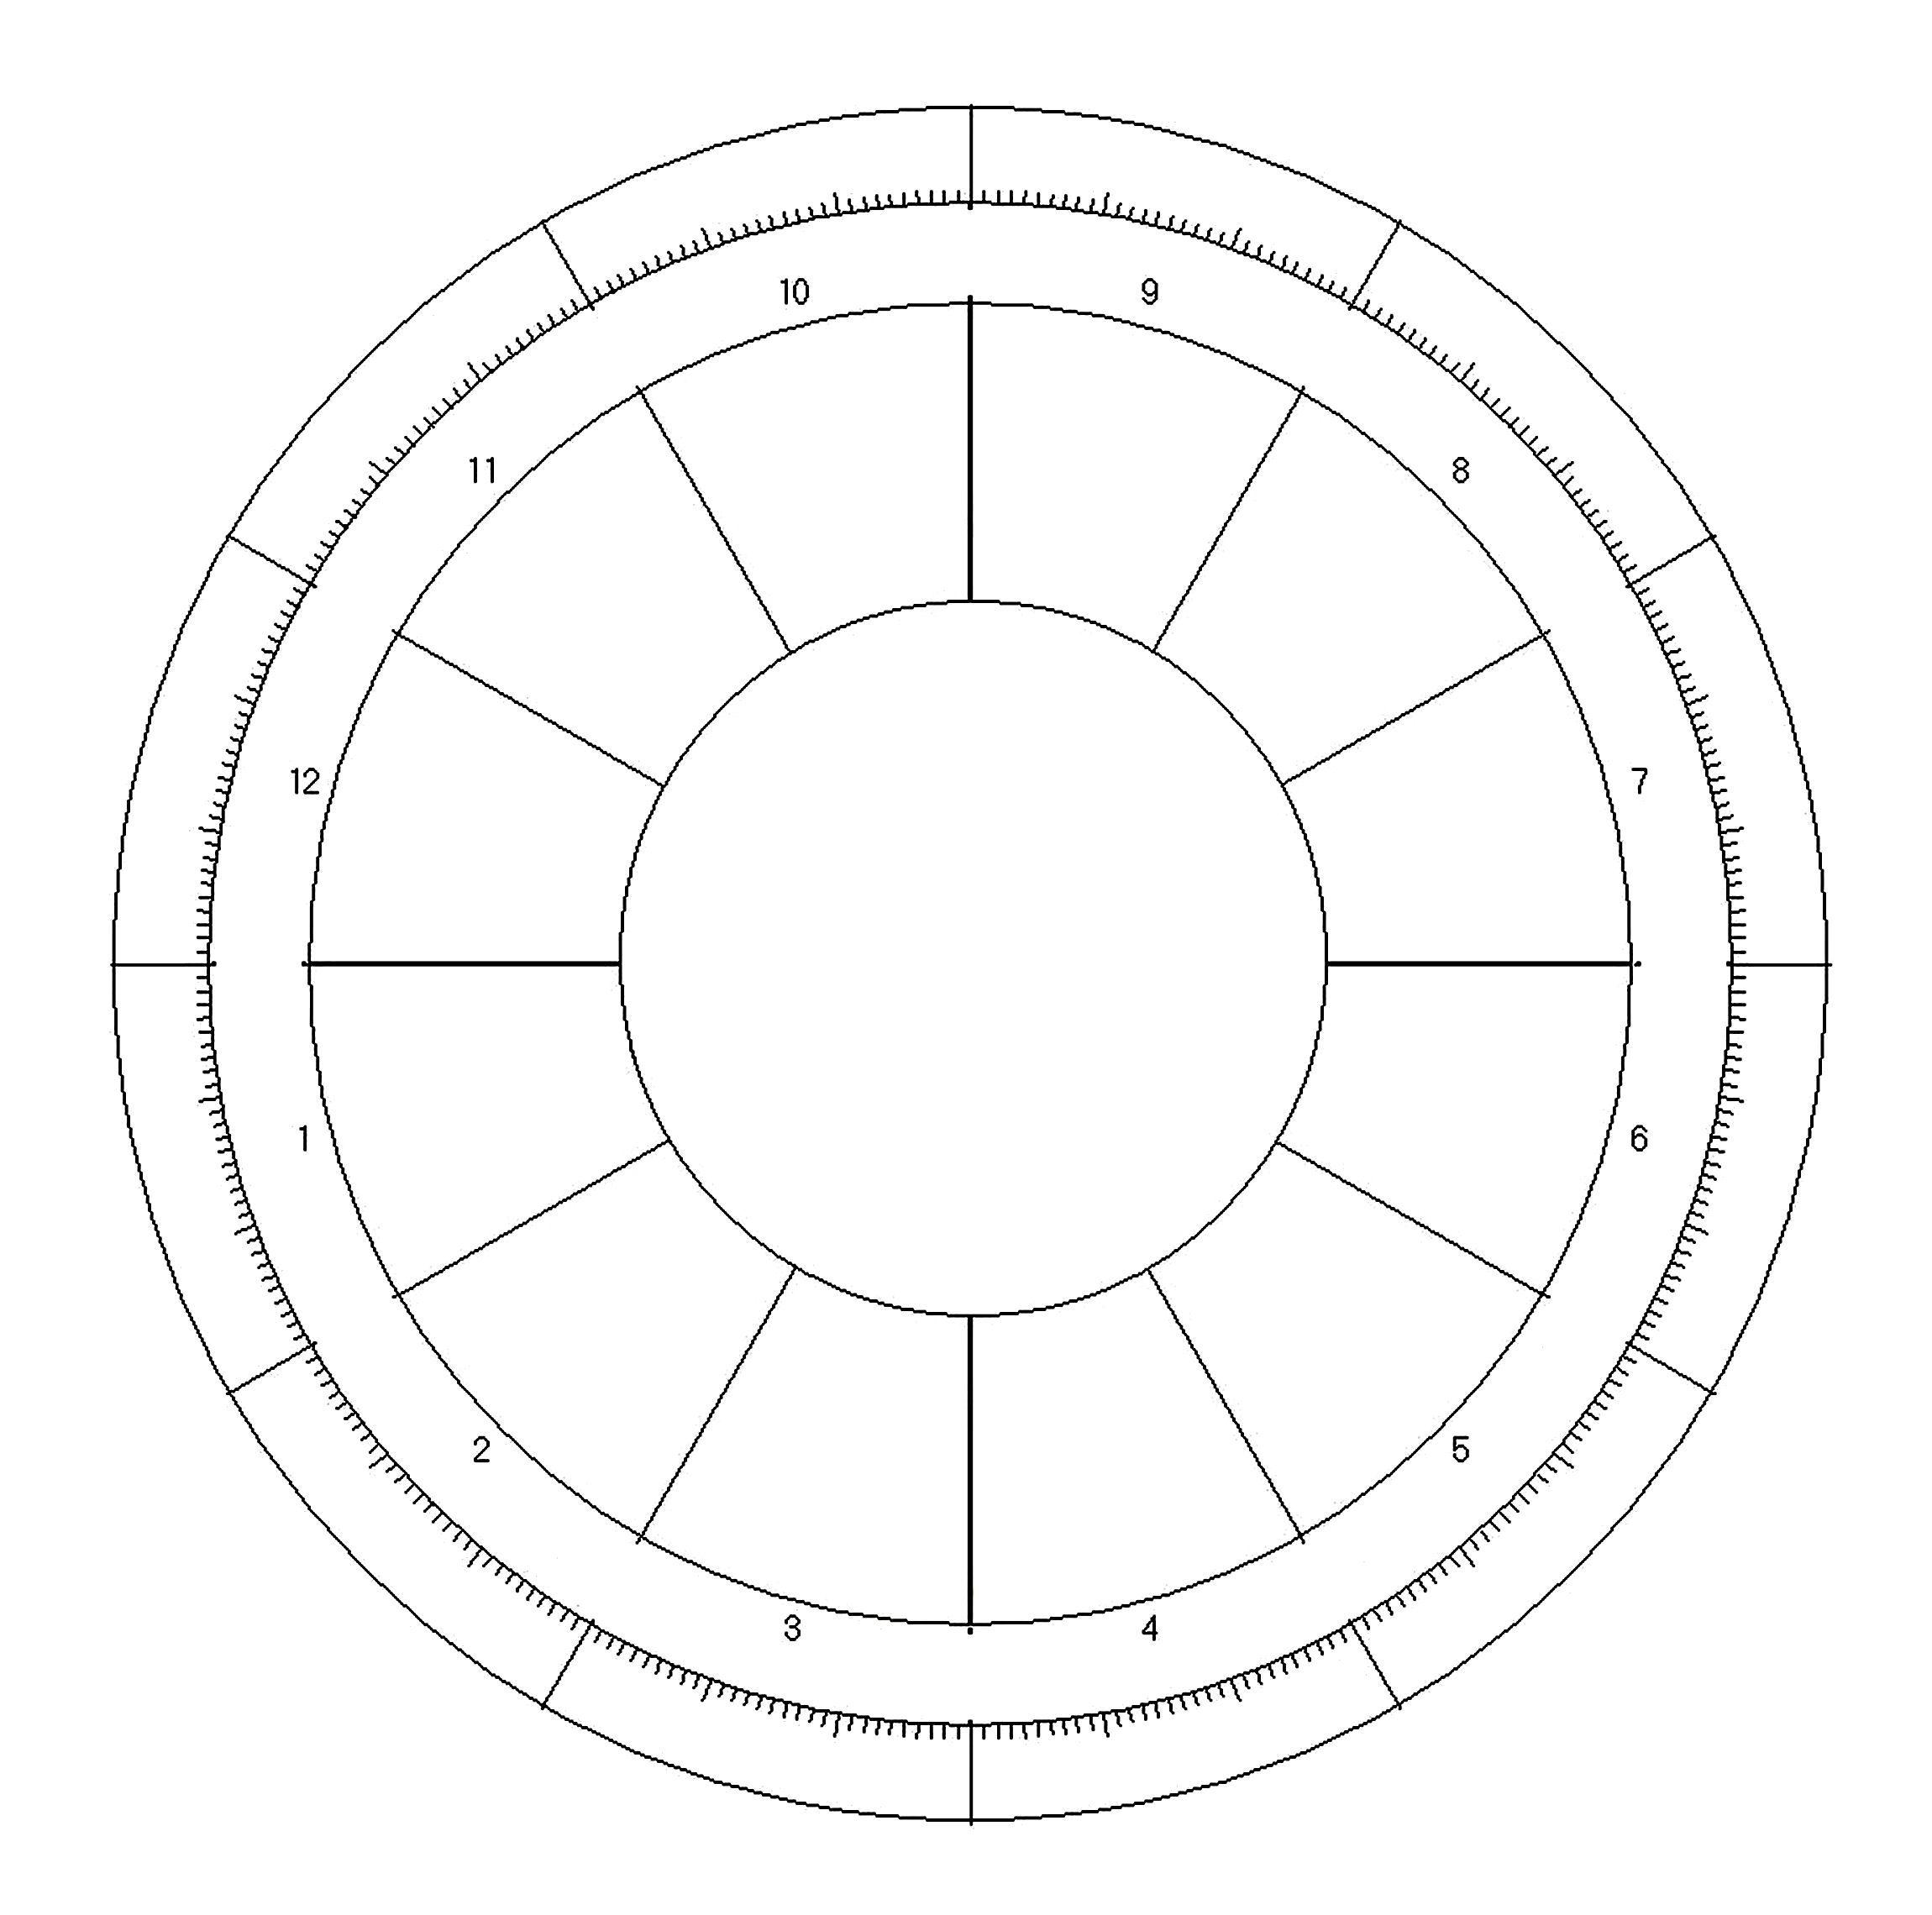 Image Result For Astrological Wheel Template